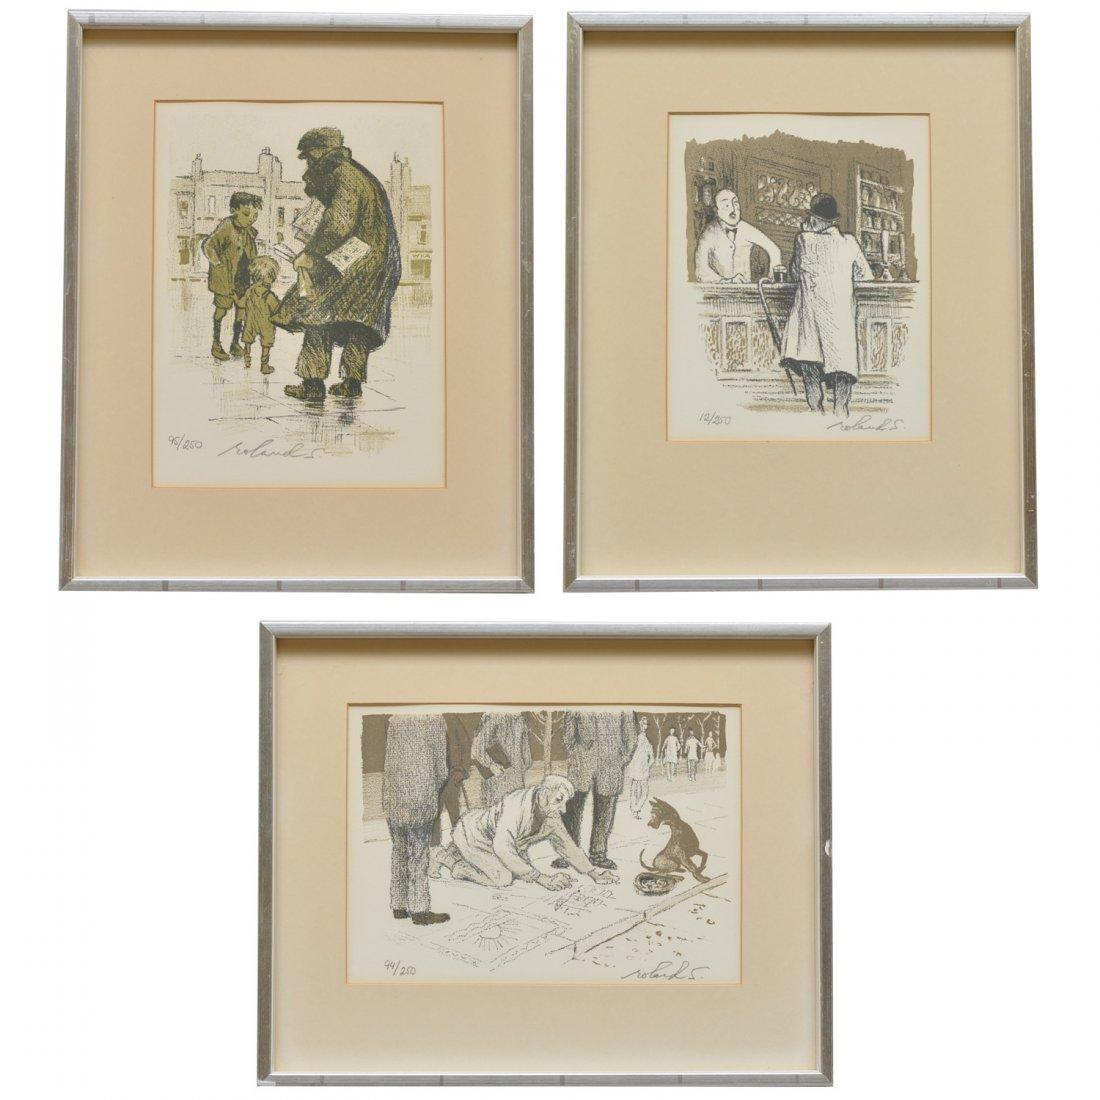 54: ROLAND SVENSSON, litografier, 3 st